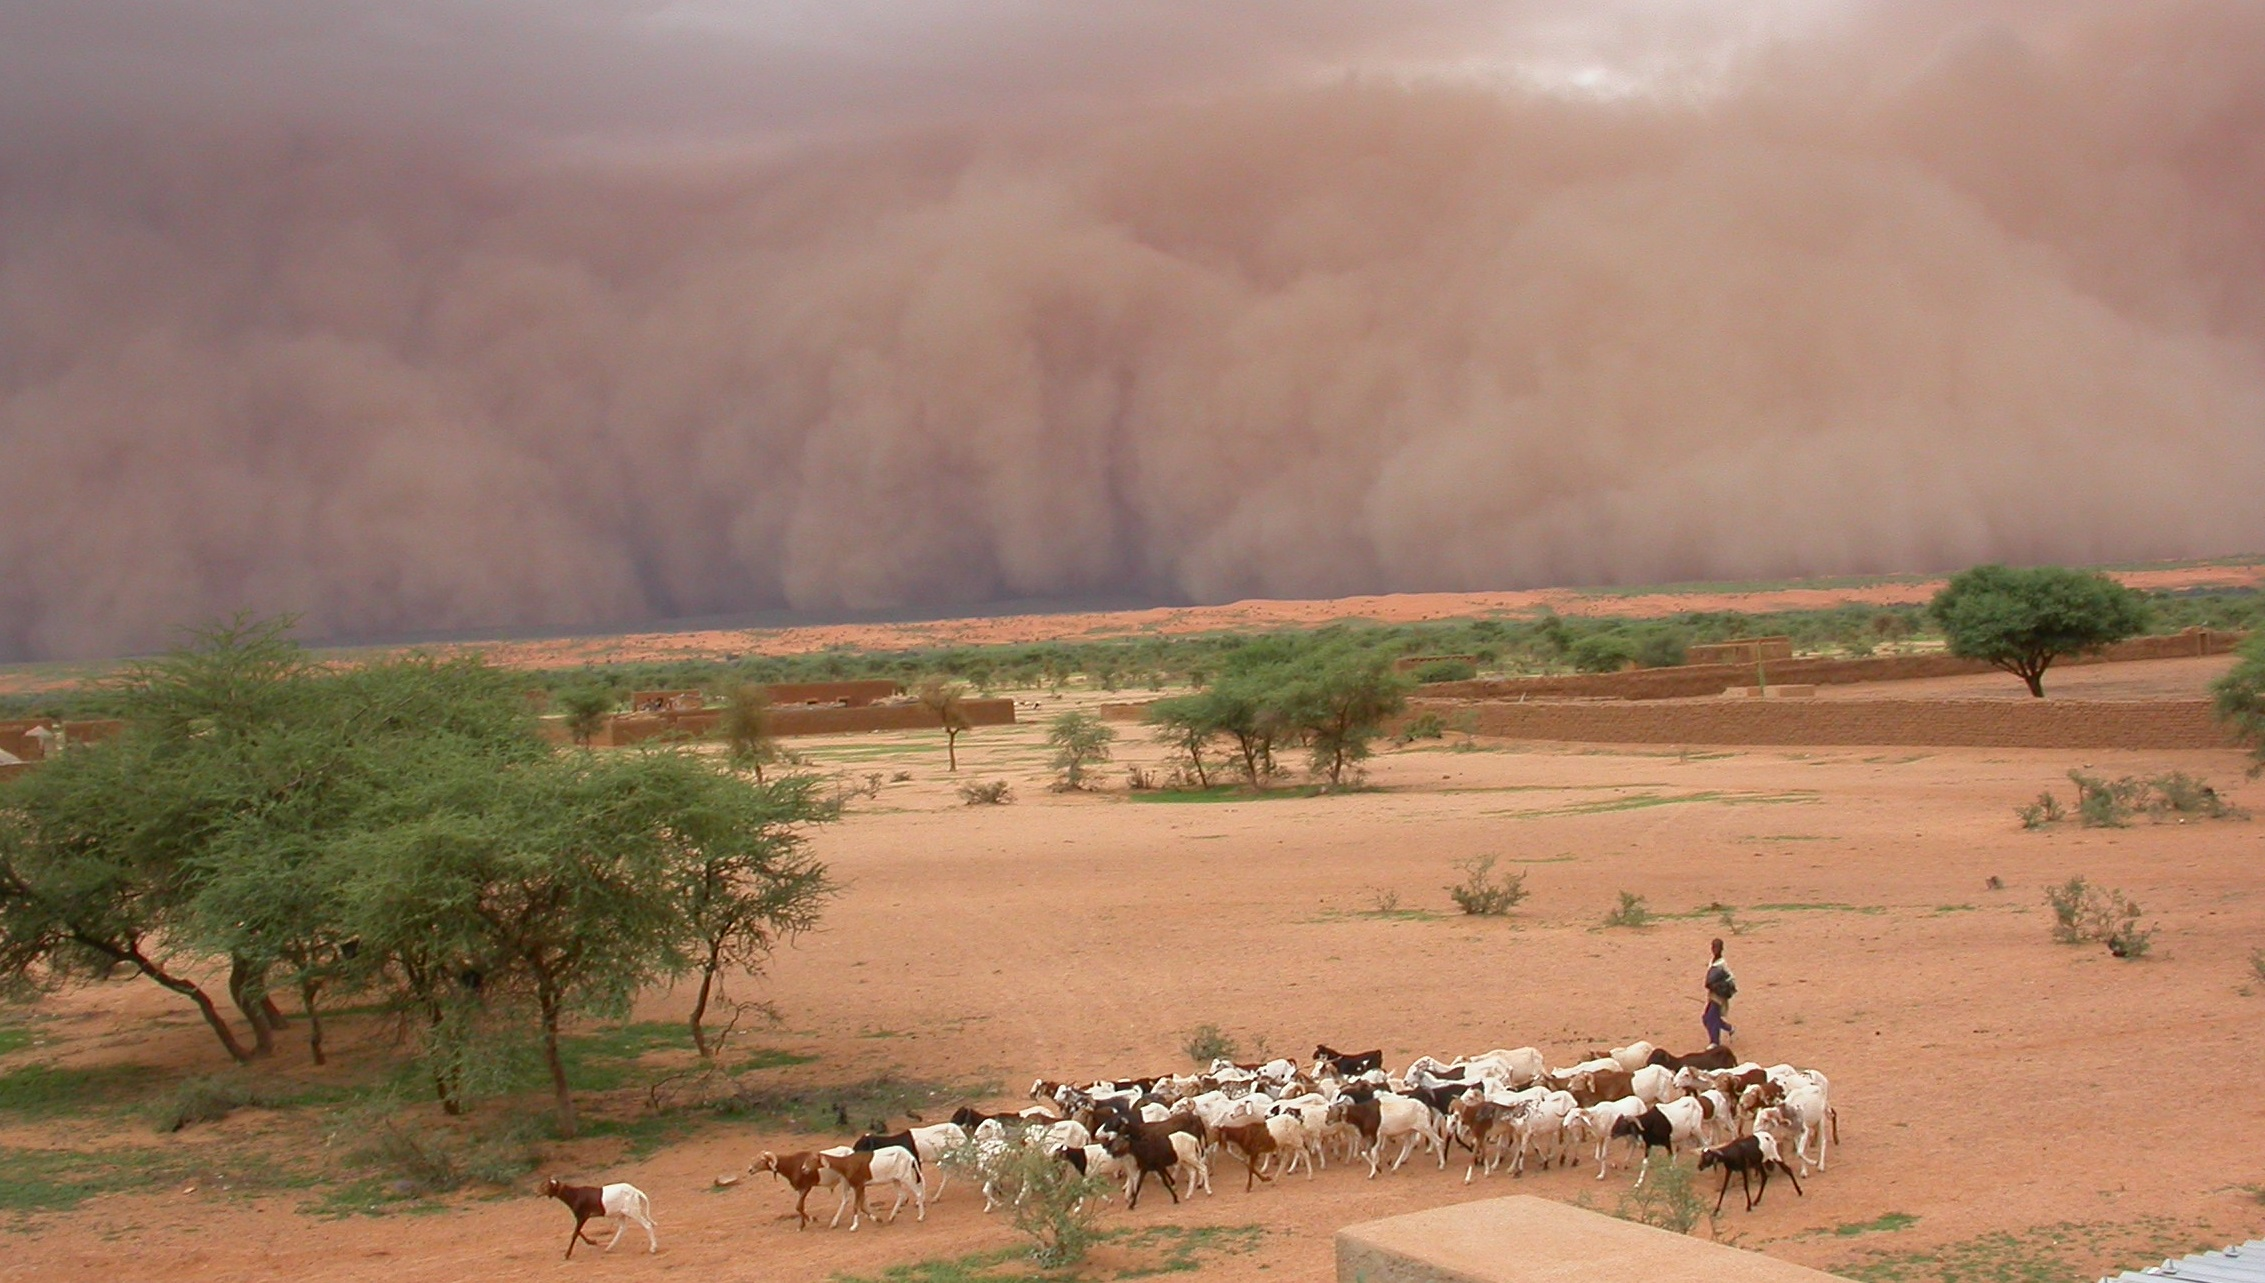 A dust storm in Mali_Photo Françoise Guichard, Laurent Kergoat, CNRS Photo Library.jpg